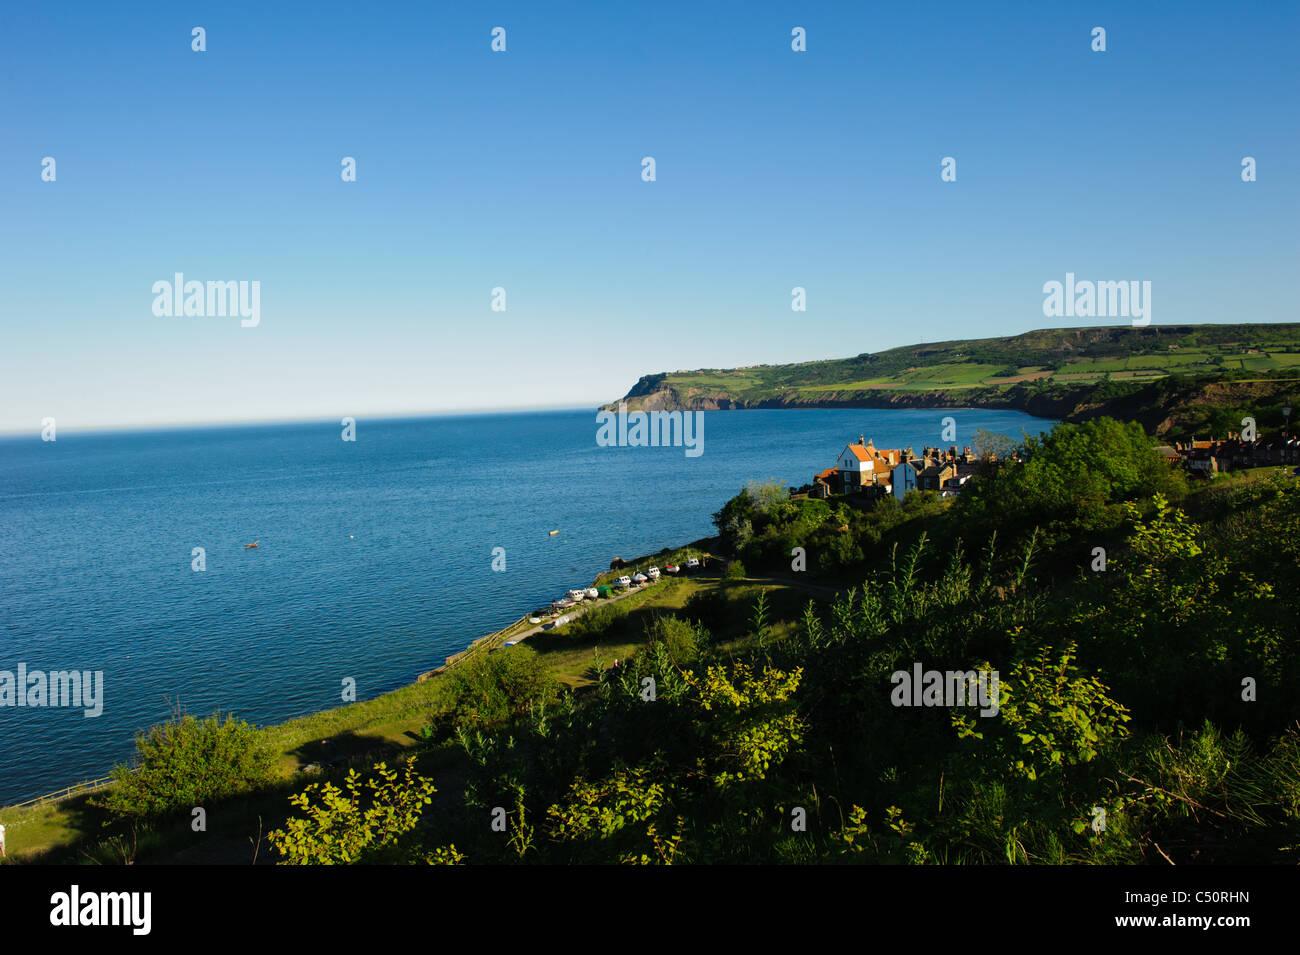 Robin Hoods Bay, North Yorkshire - Stock Image